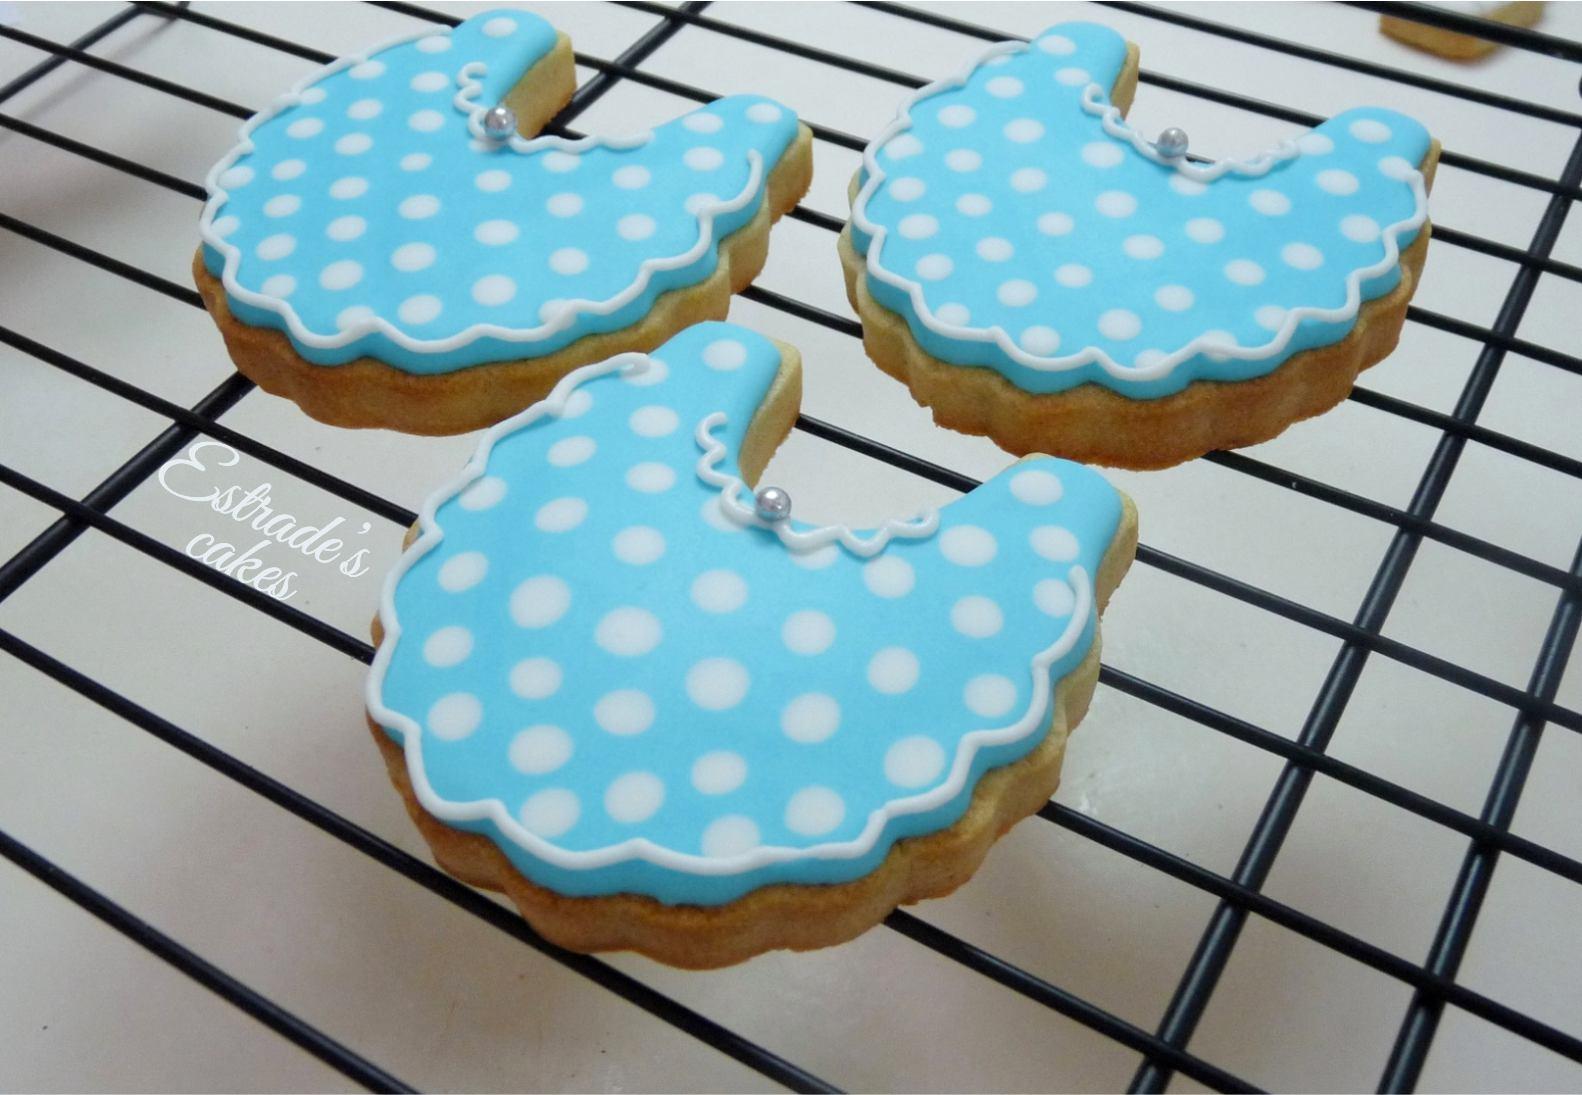 galletas para bautizo decoradas con glasa - babero